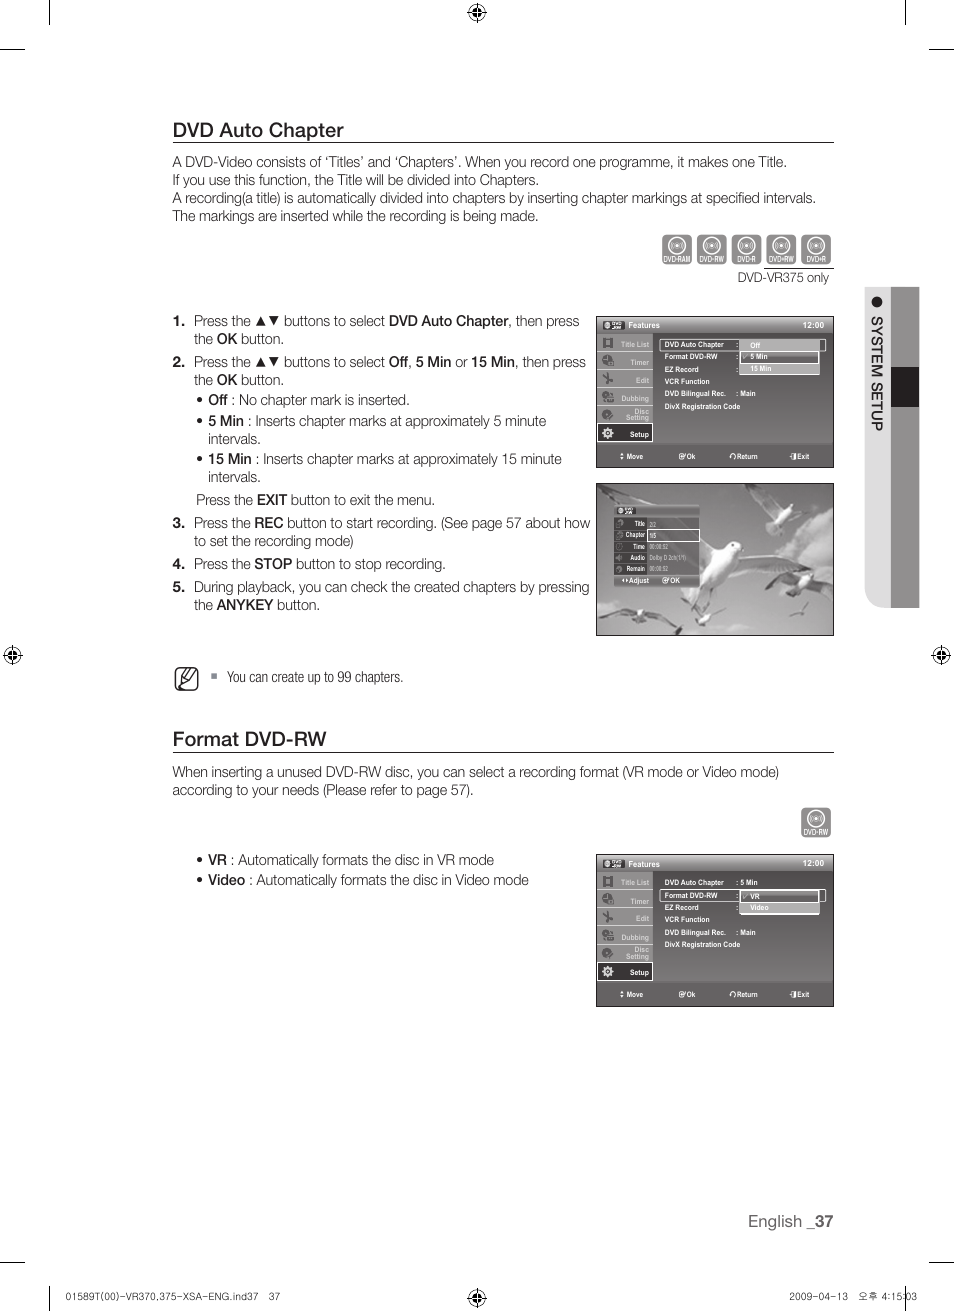 xcvkl dvd auto chapter format dvd rw samsung dvd vr375 user rh manualsdir com dvd vr357 manual samsung dvd vr375 manual pdf